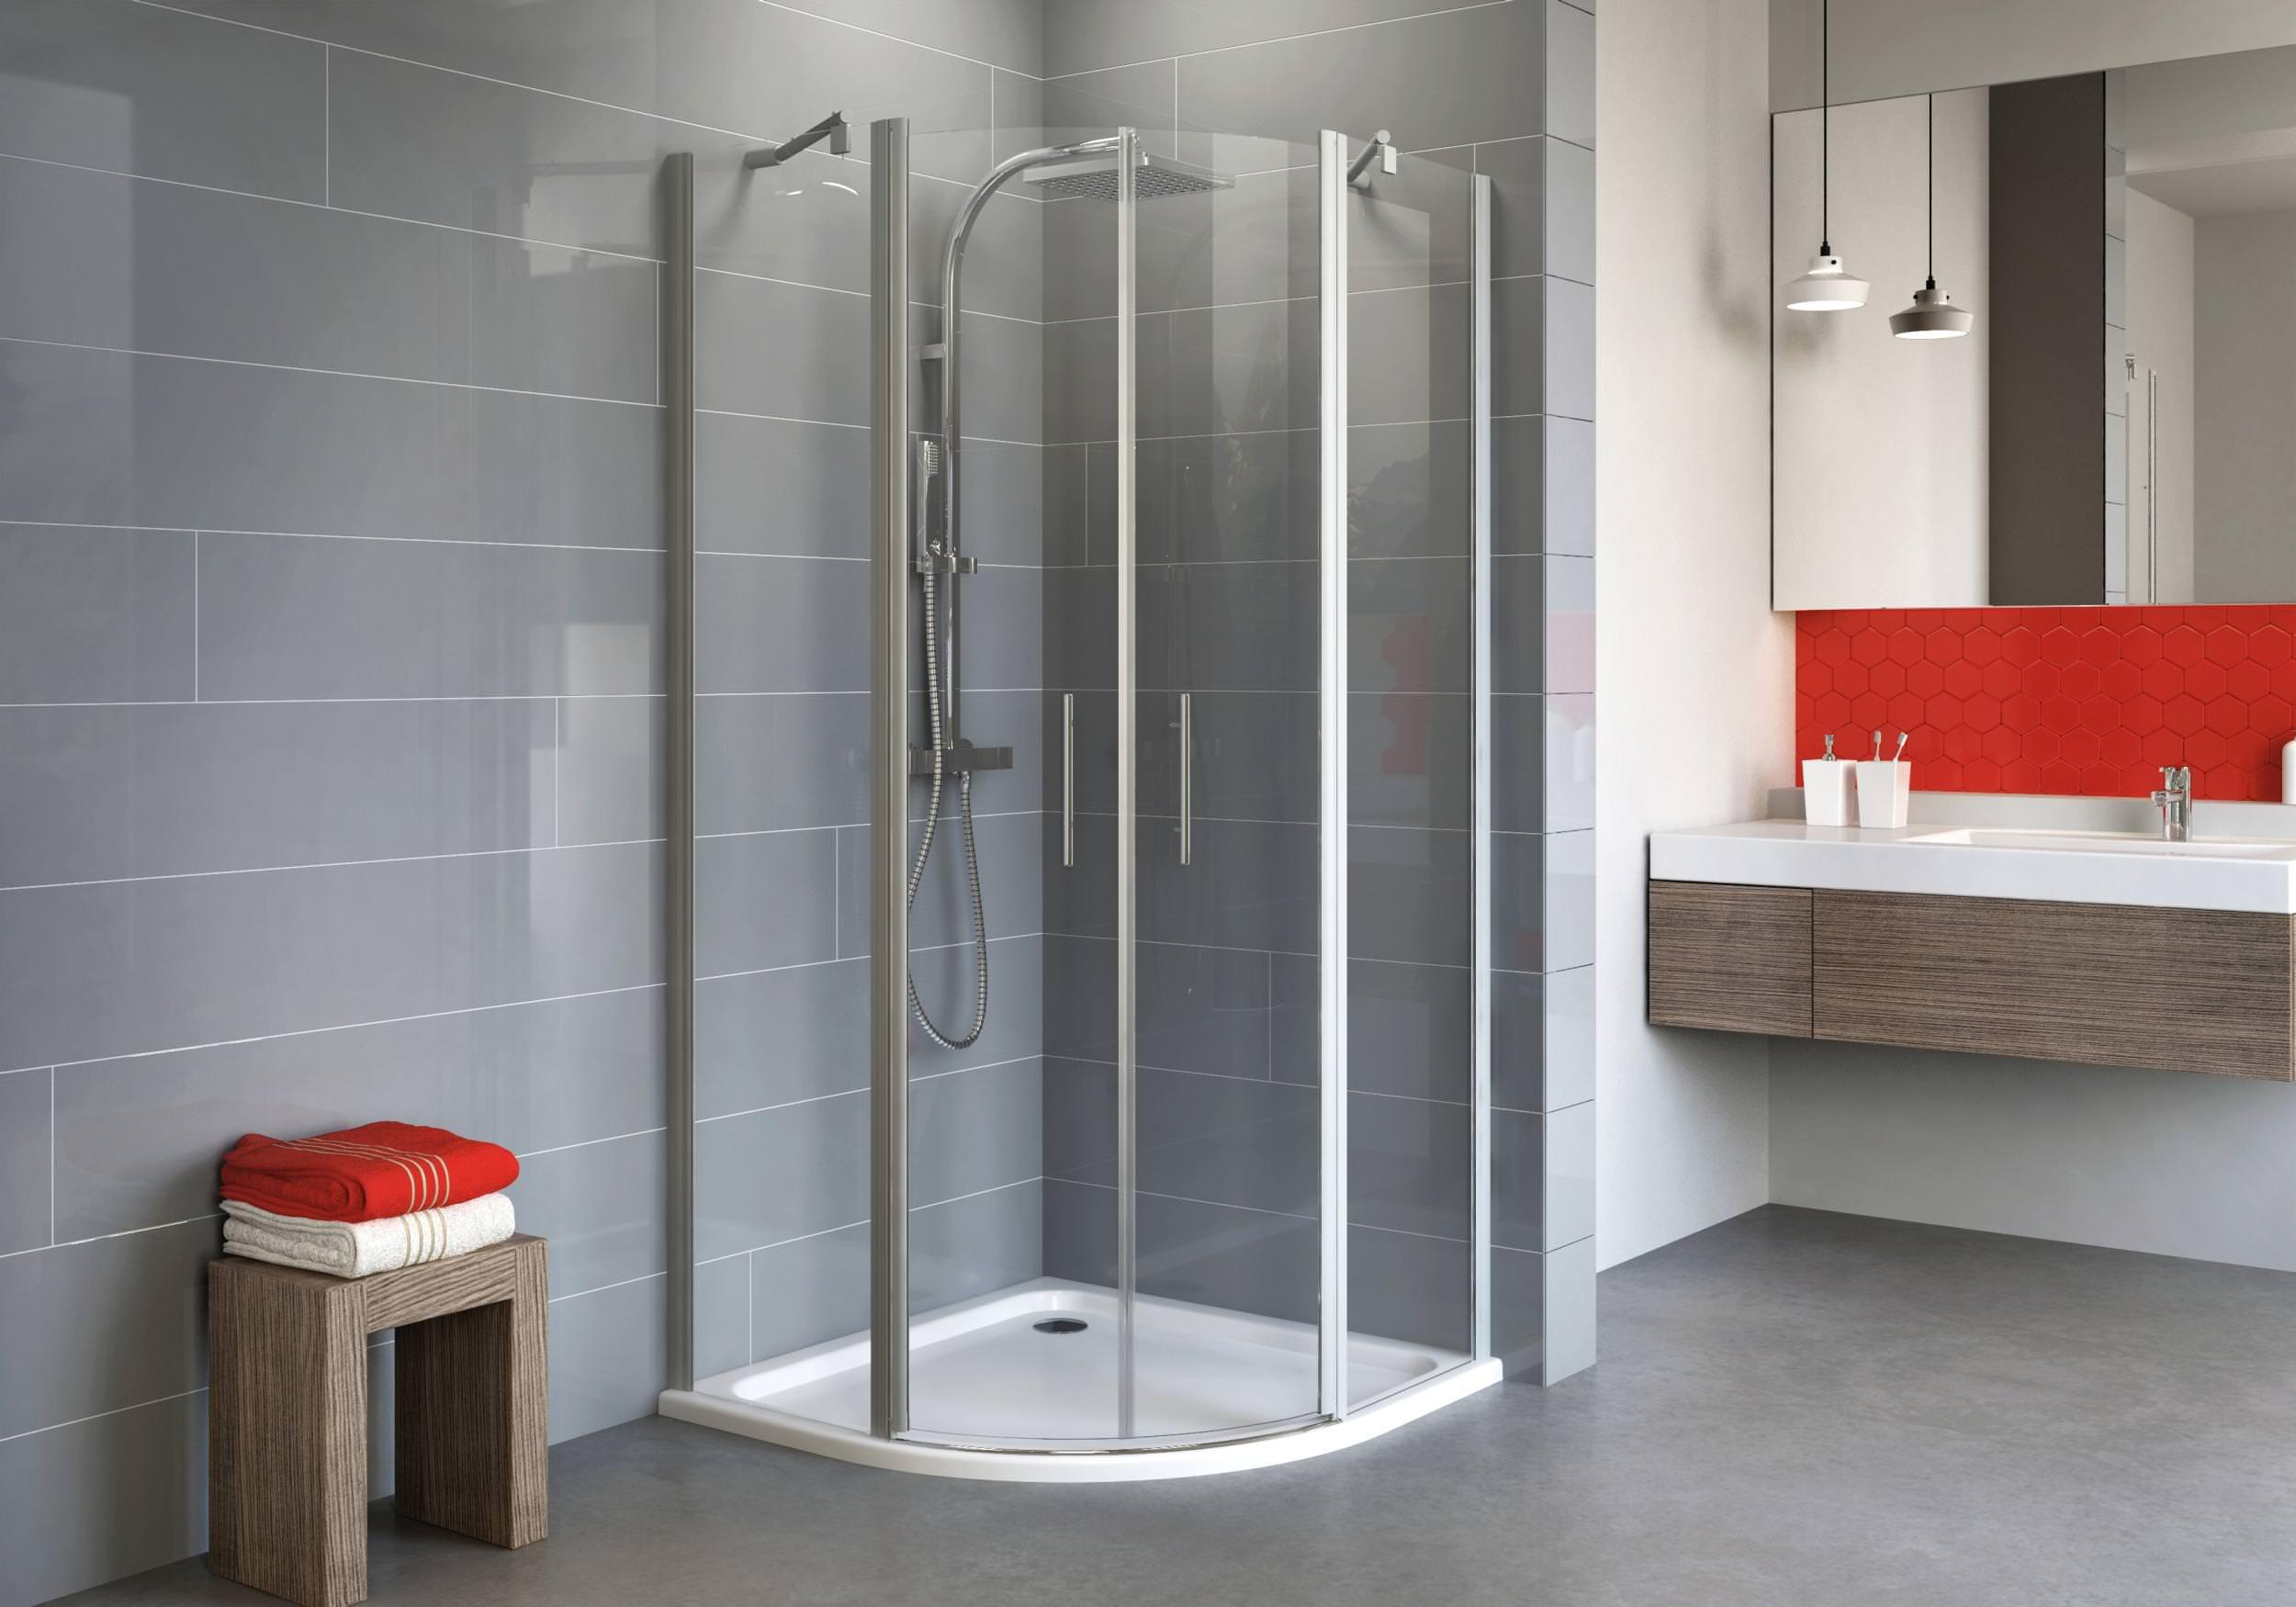 schulte alexa style 2 0 runddusche radius 550 klarglas hell alunatur 80 x 80 cm 192 cm. Black Bedroom Furniture Sets. Home Design Ideas